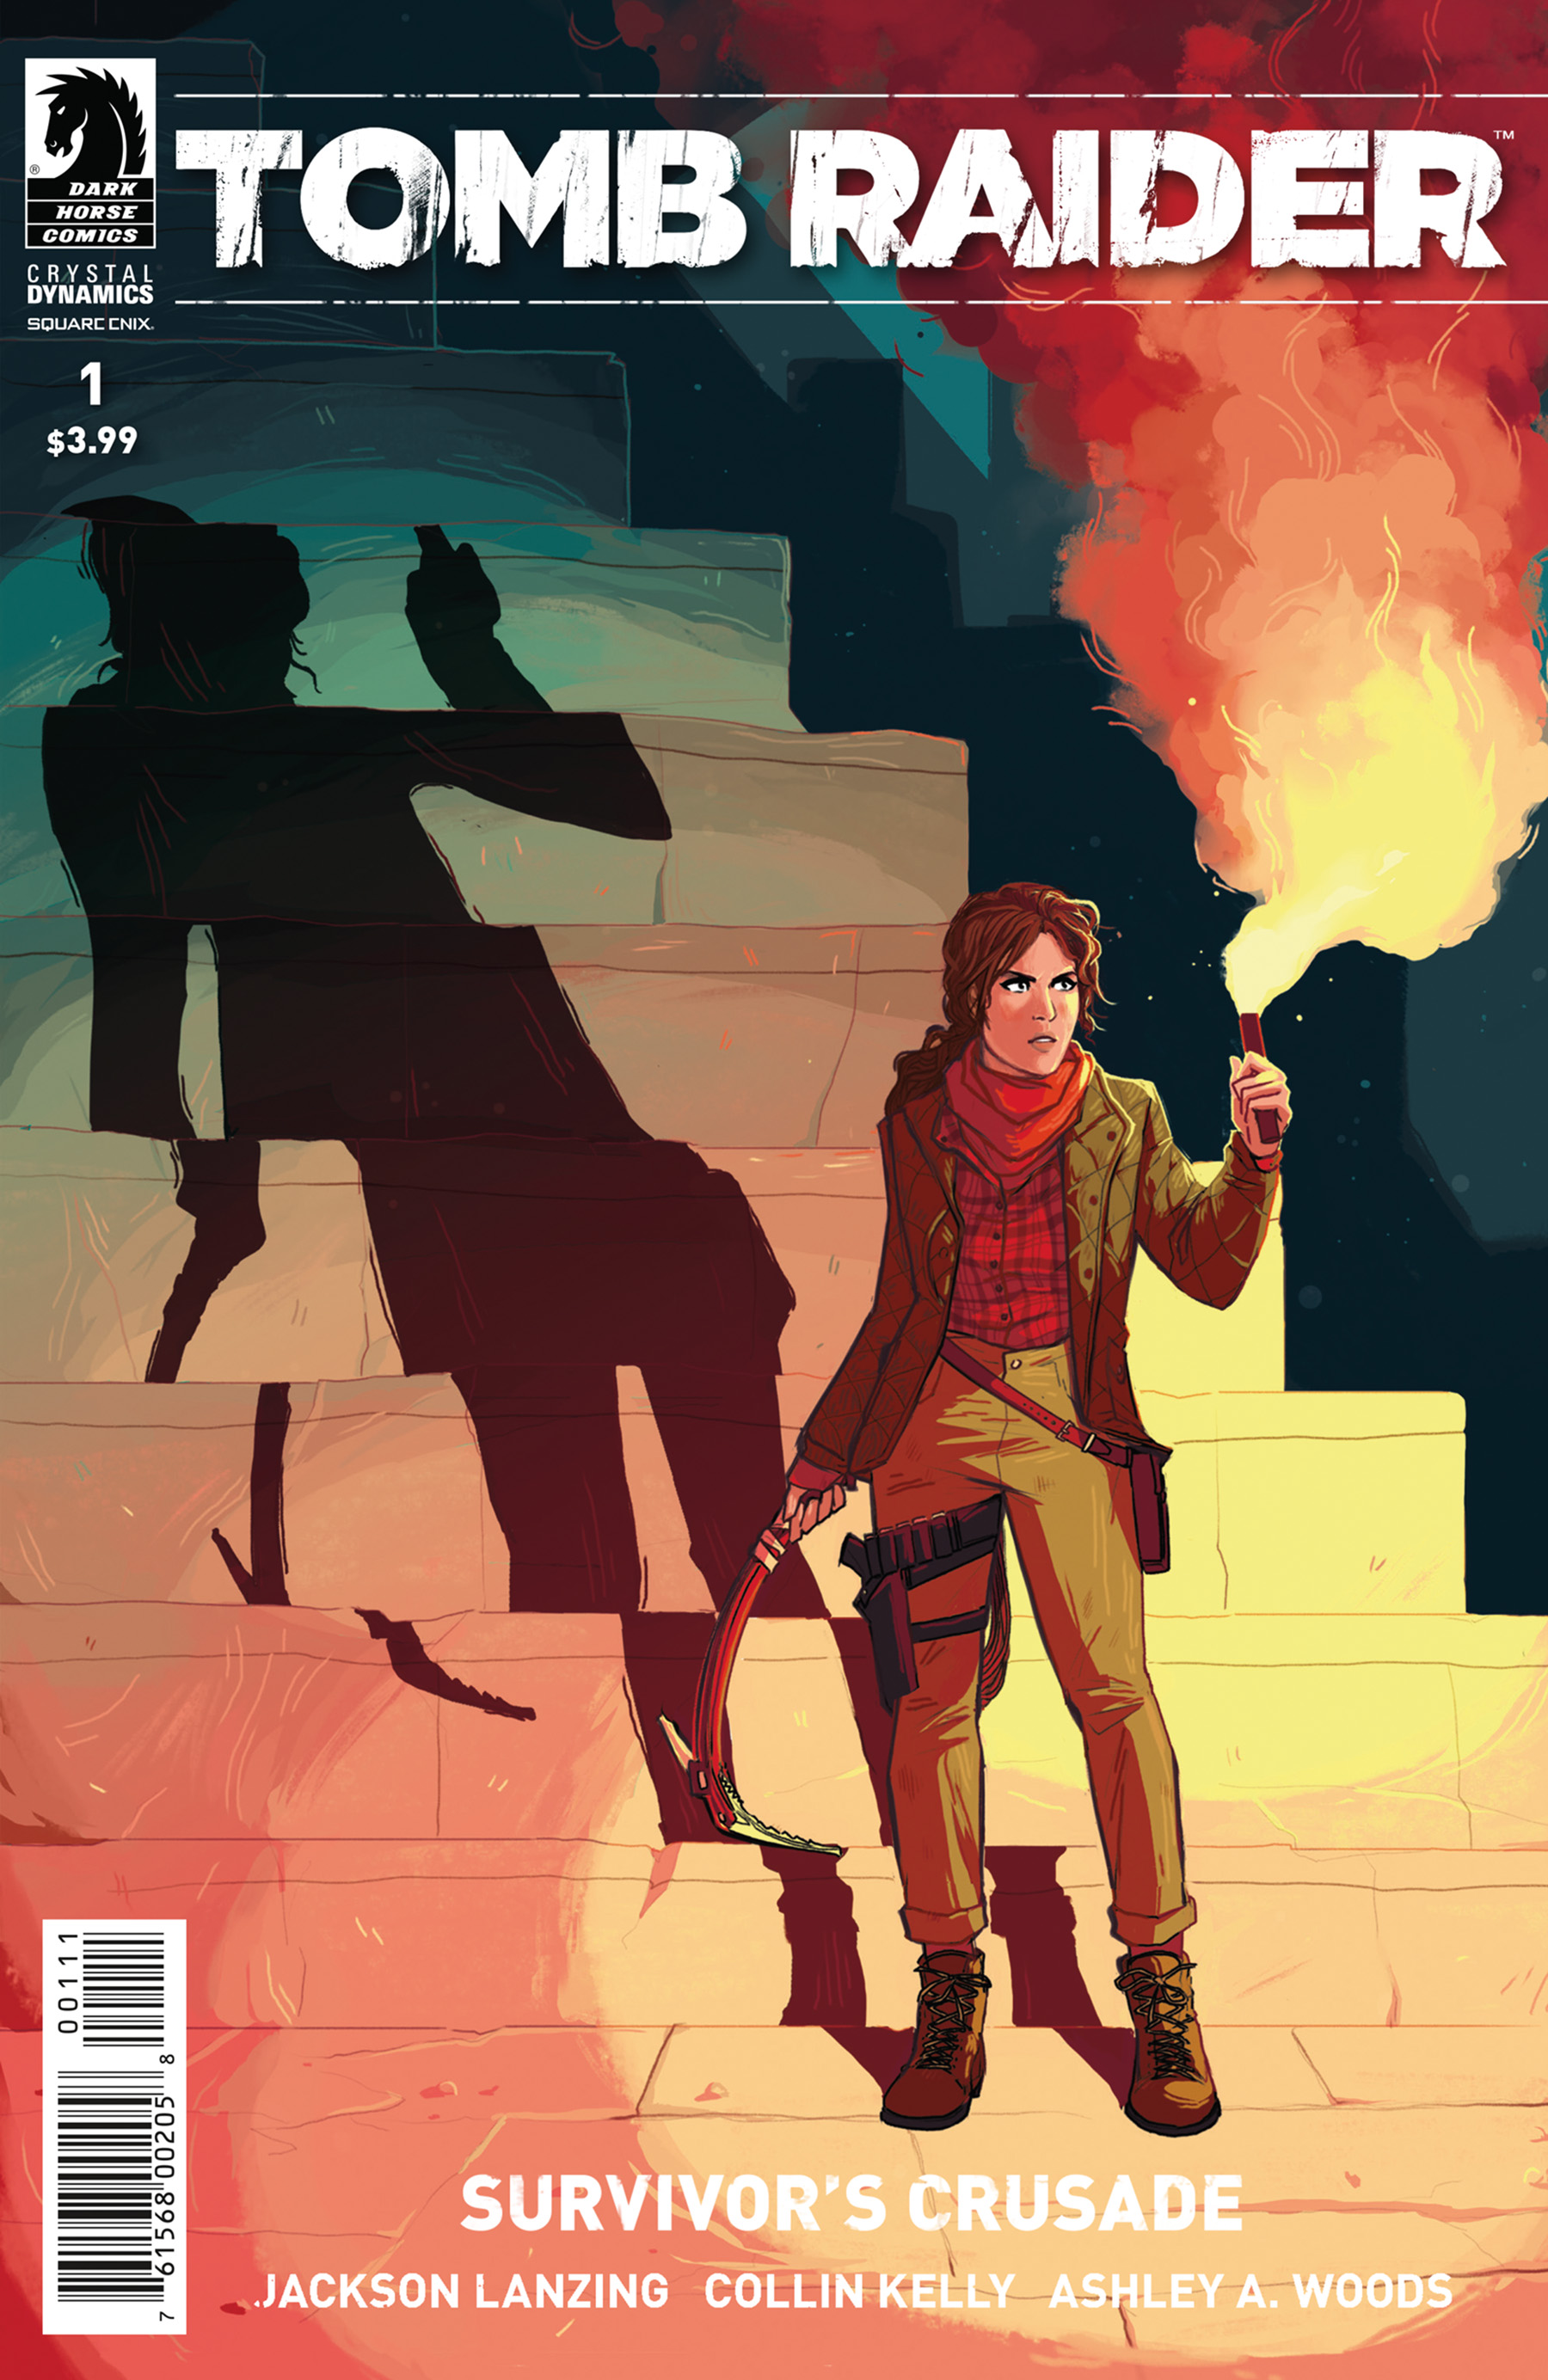 Lara Croft returns to comics with Tomb Raider: Survivor's Crusade